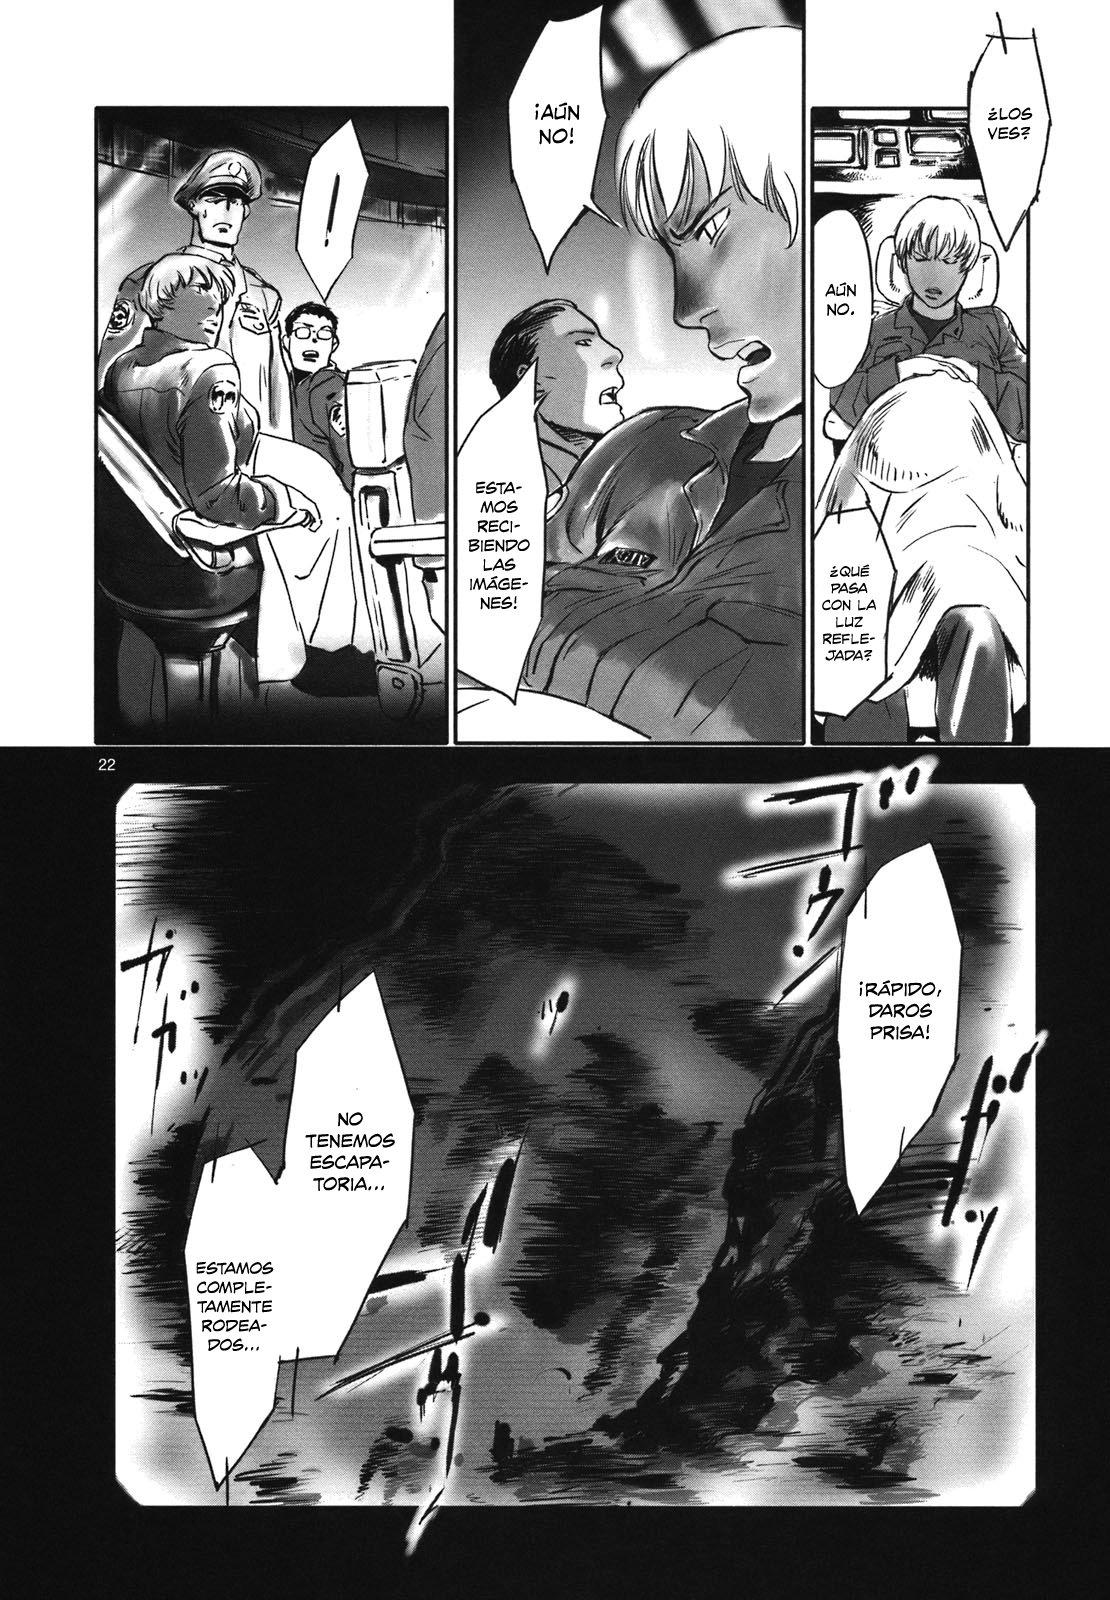 https://nine.mangadogs.com/es_manga/pic8/7/36679/946758/abdeb6f575ac5c6676b747bca8d09cc2.jpg Page 28